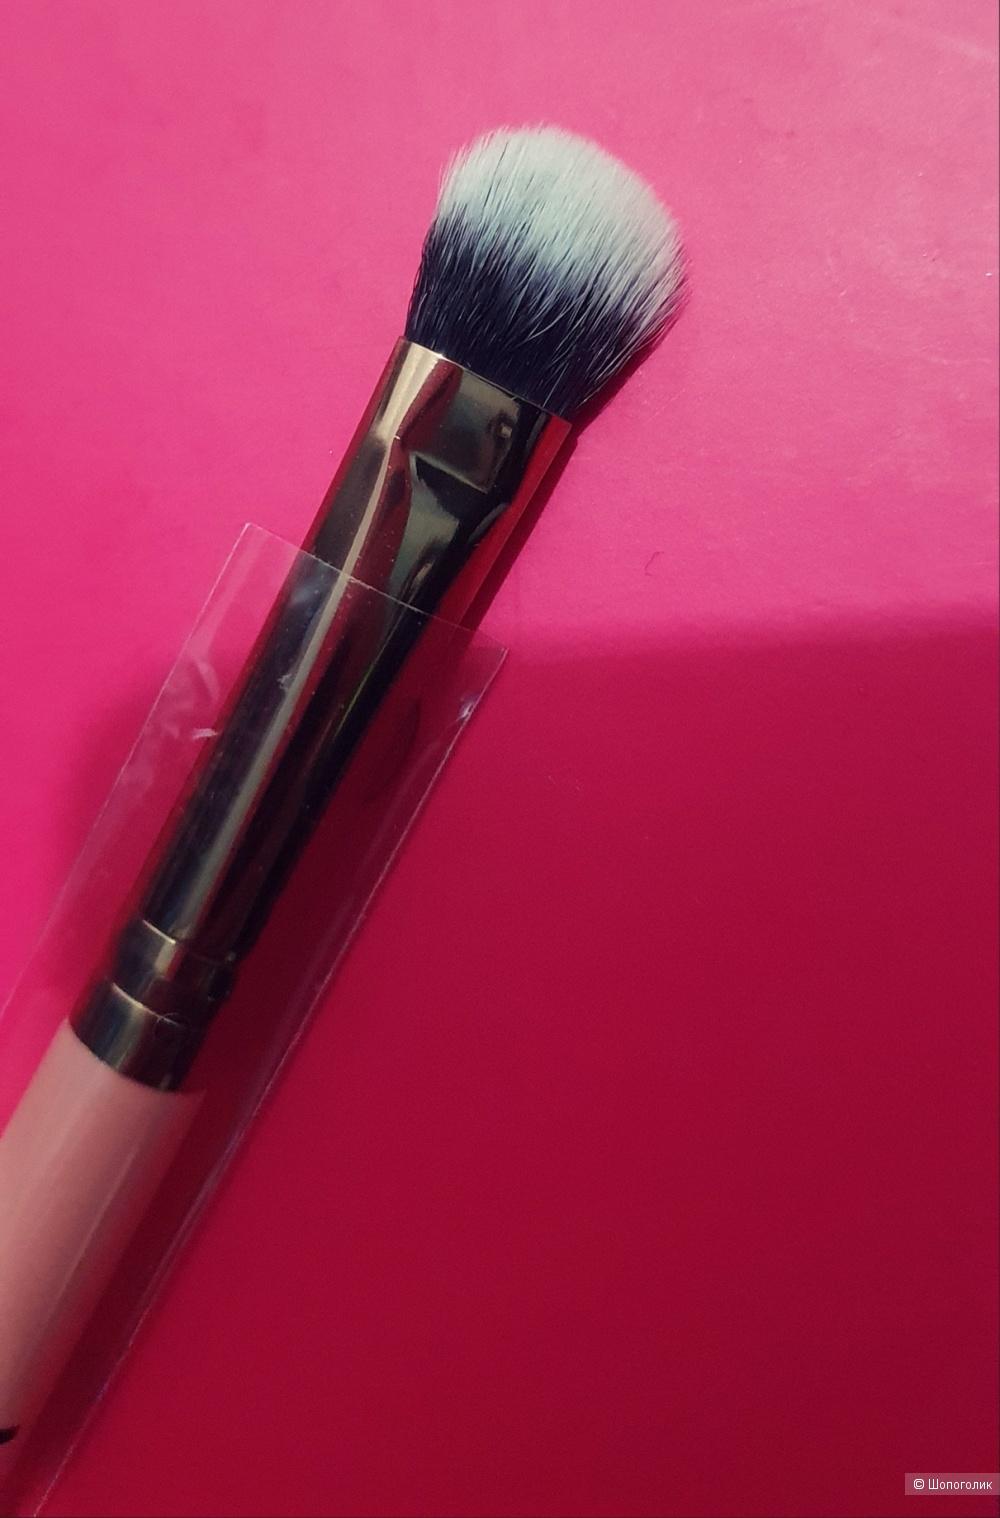 Luxie 209 large shader brush